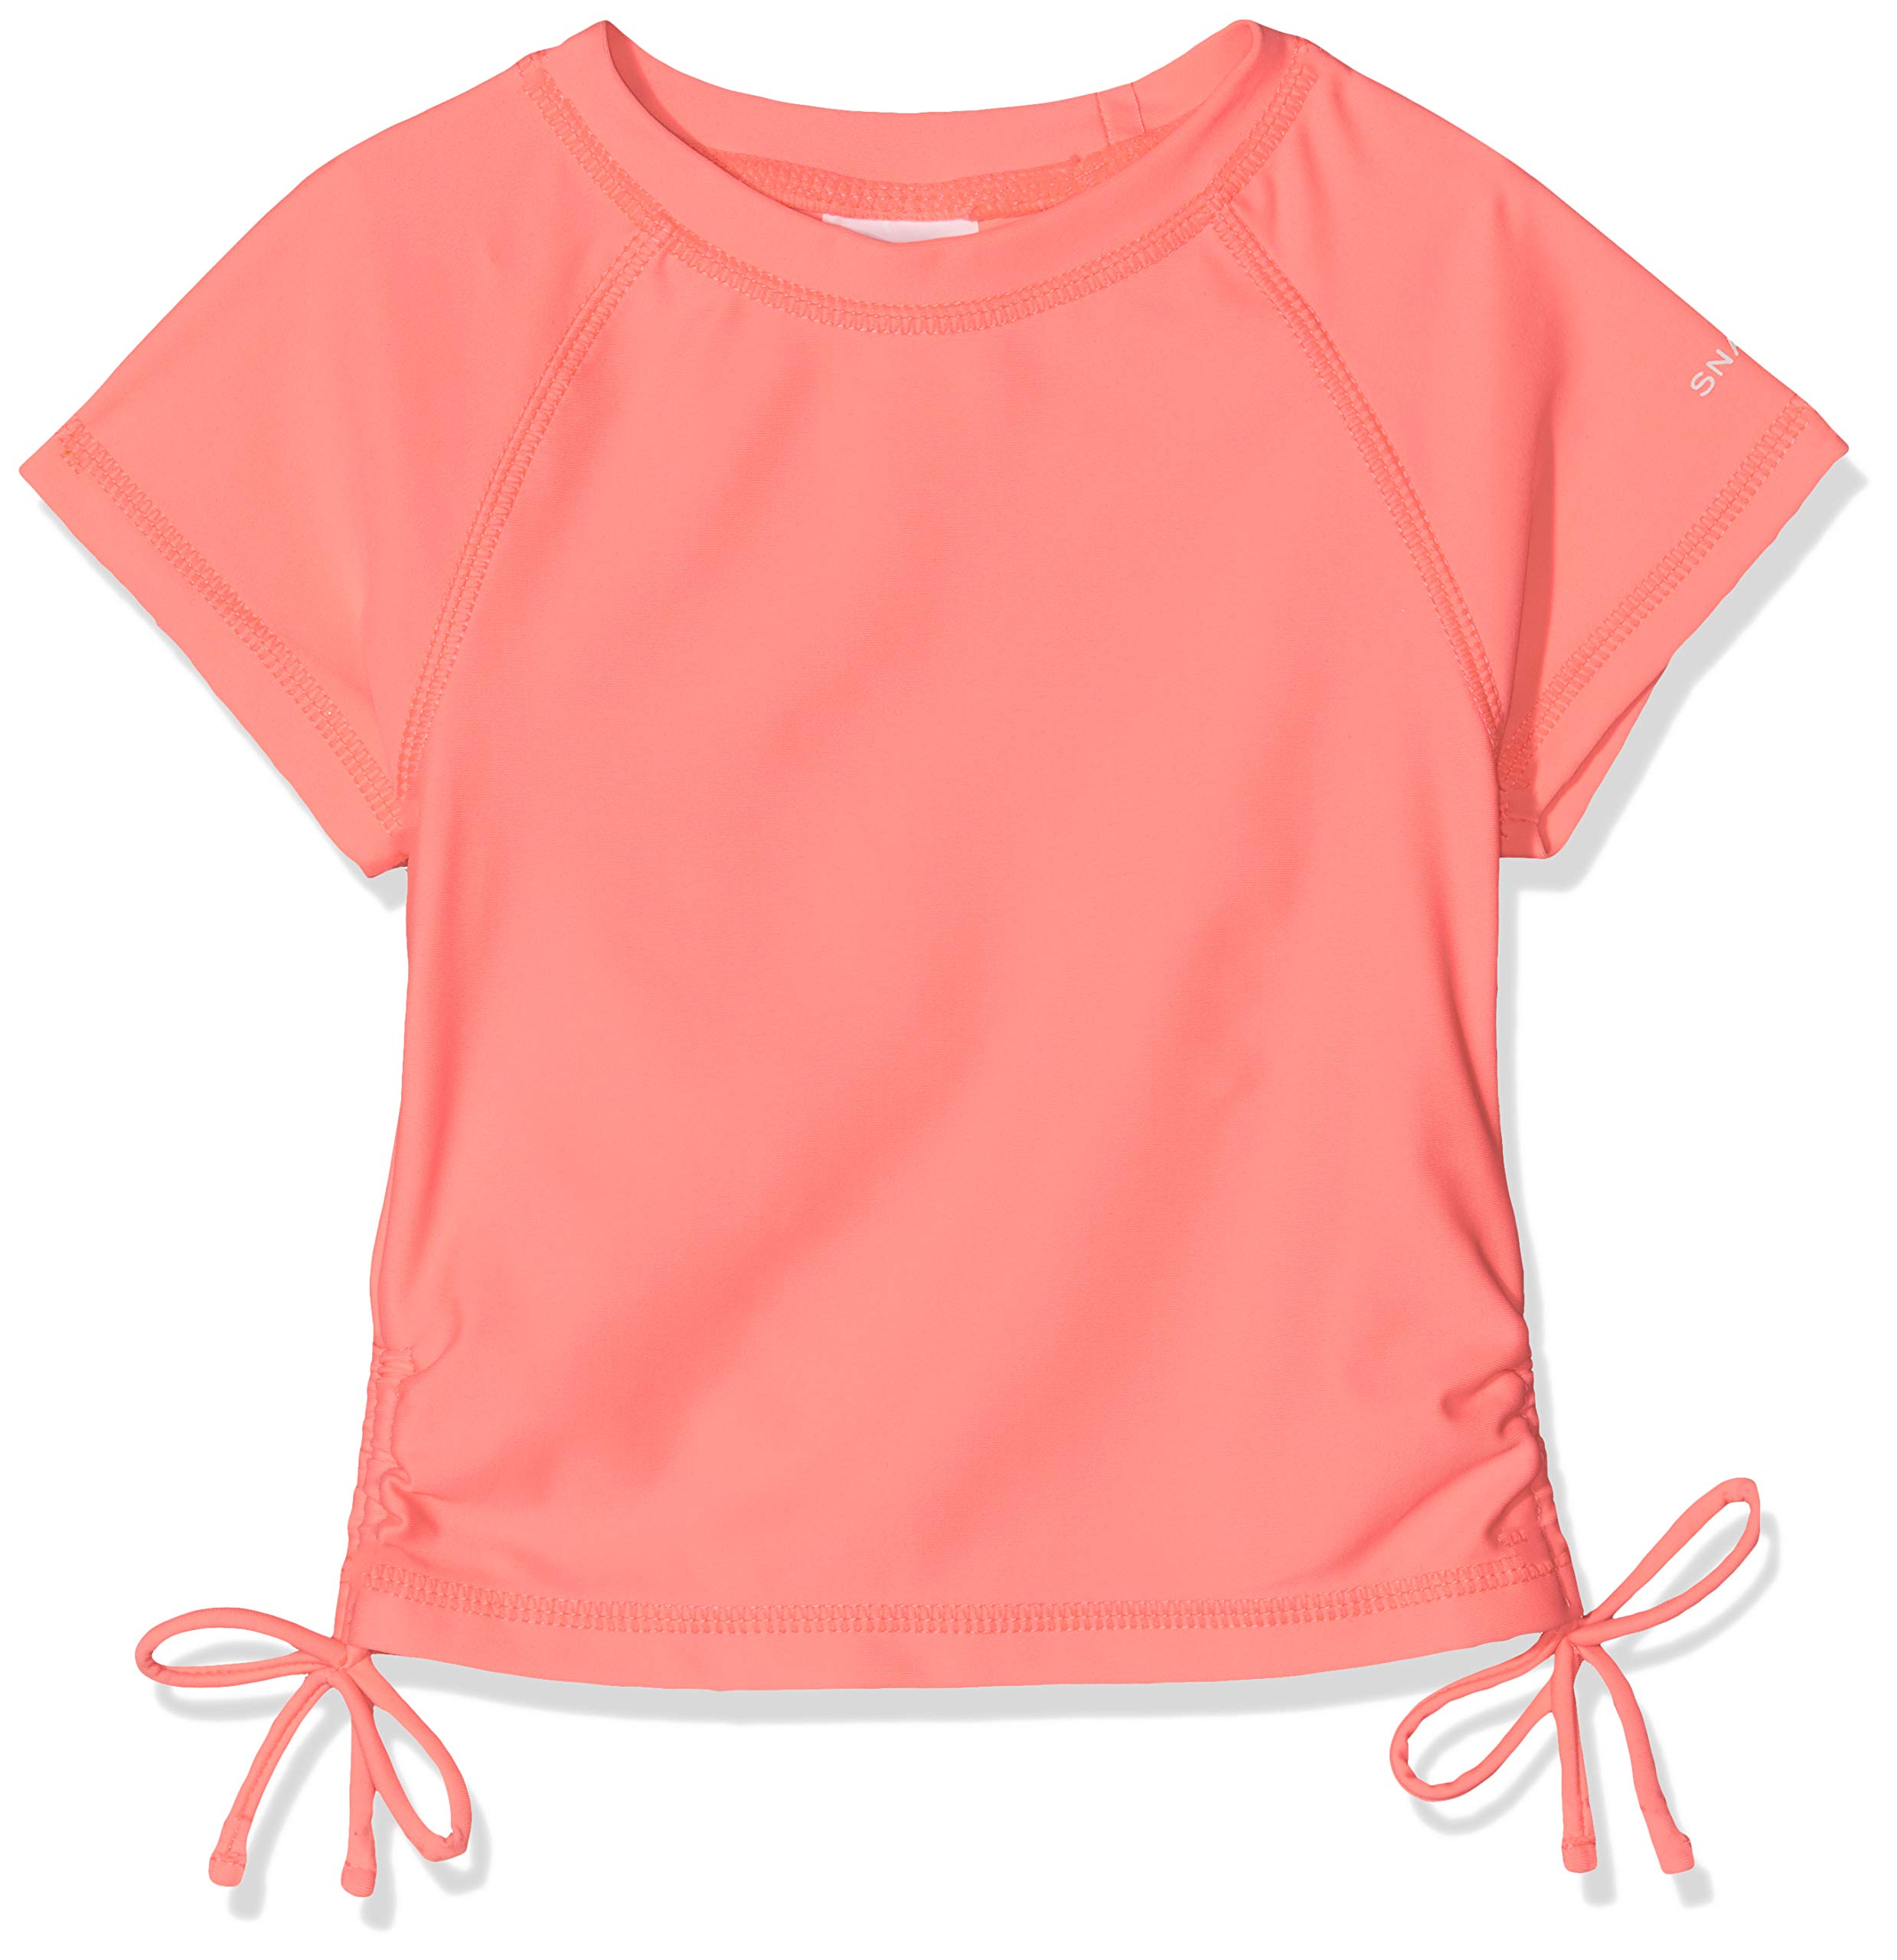 Snapper Rock Girls Short Sleeve Rash Top (Neon Coral, 2) by Snapper Rock